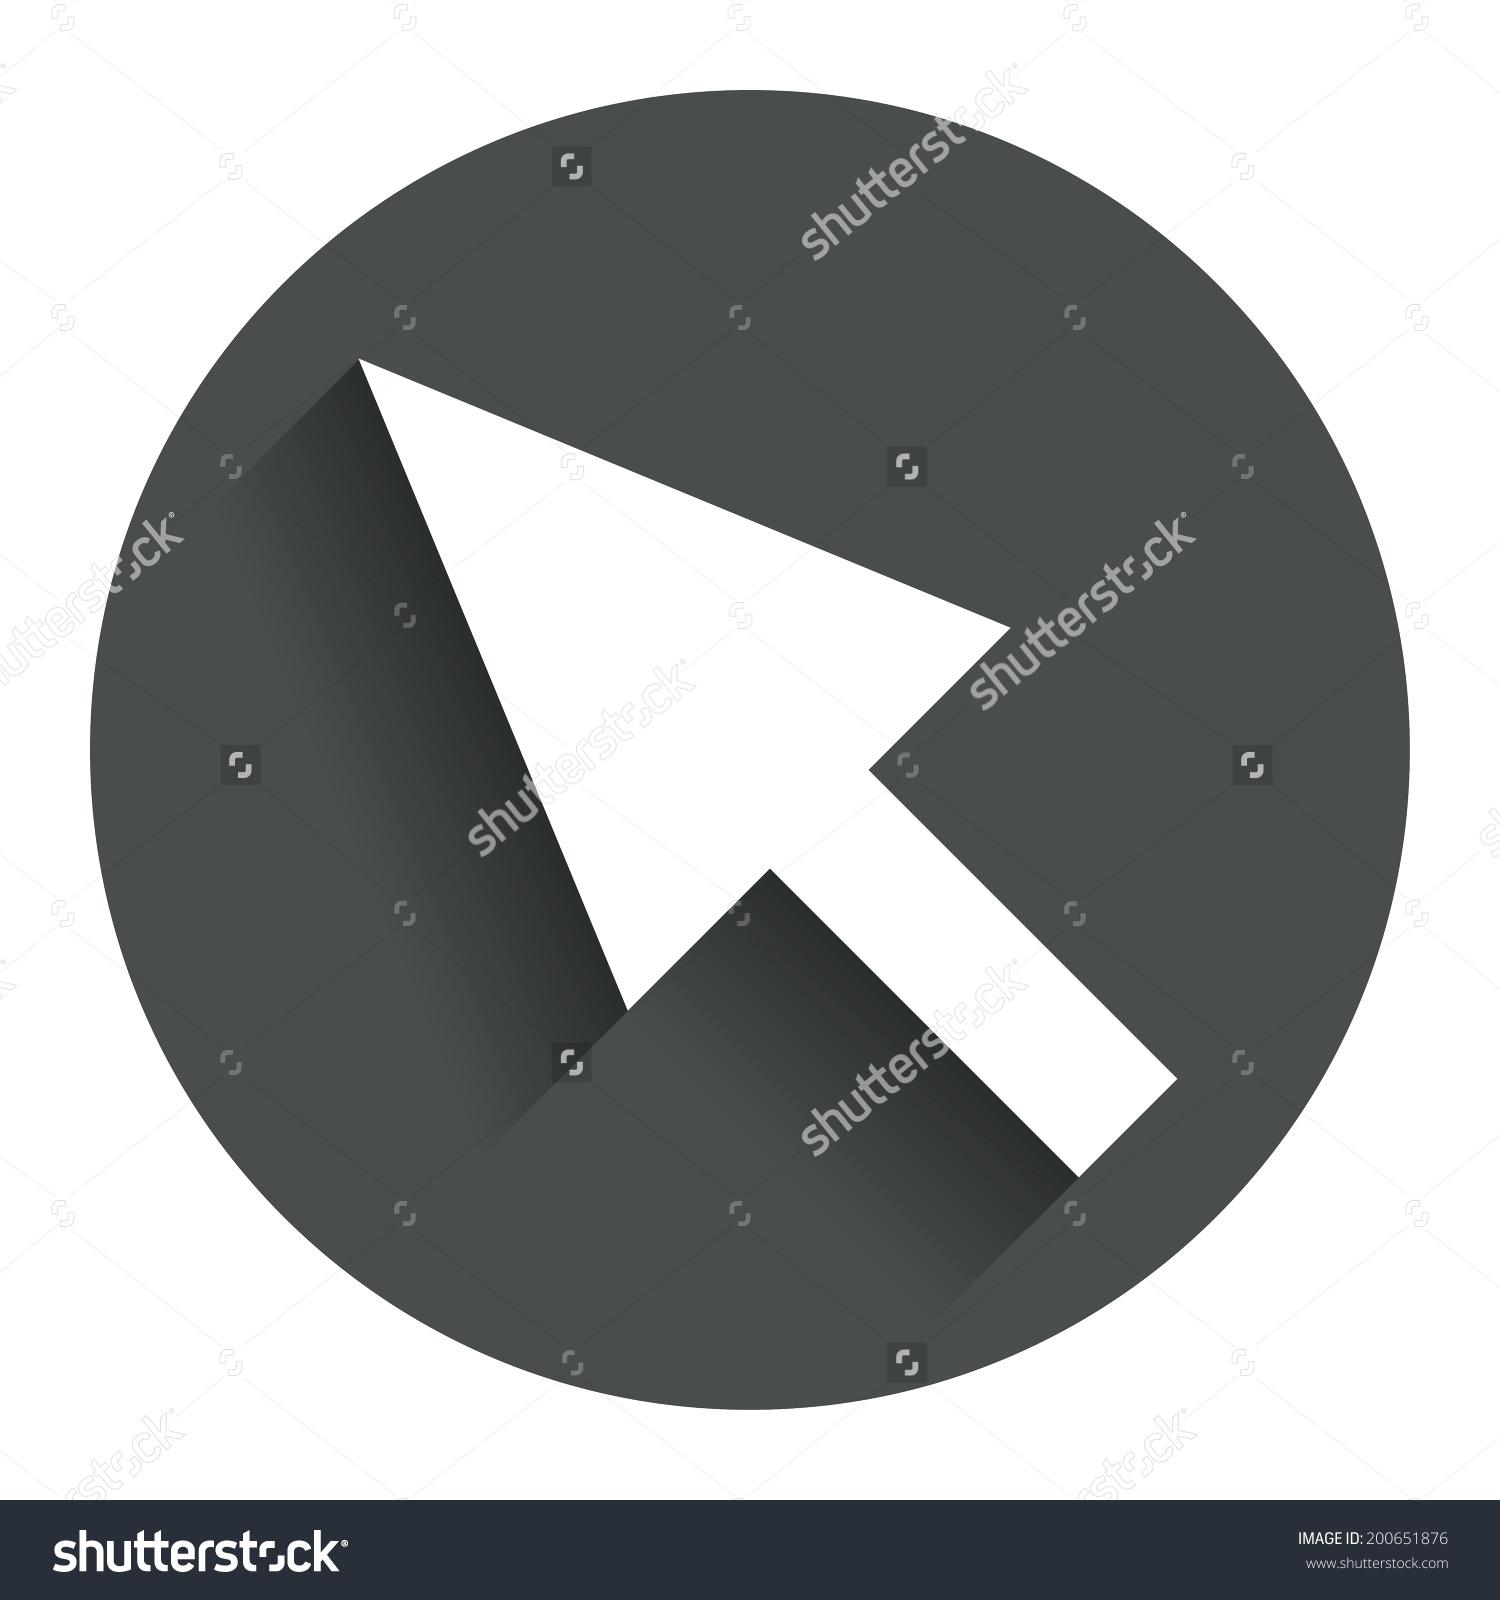 Arrow pointer clipart modern vector royalty free stock Arrow pointer clipart modern - ClipartFest vector royalty free stock